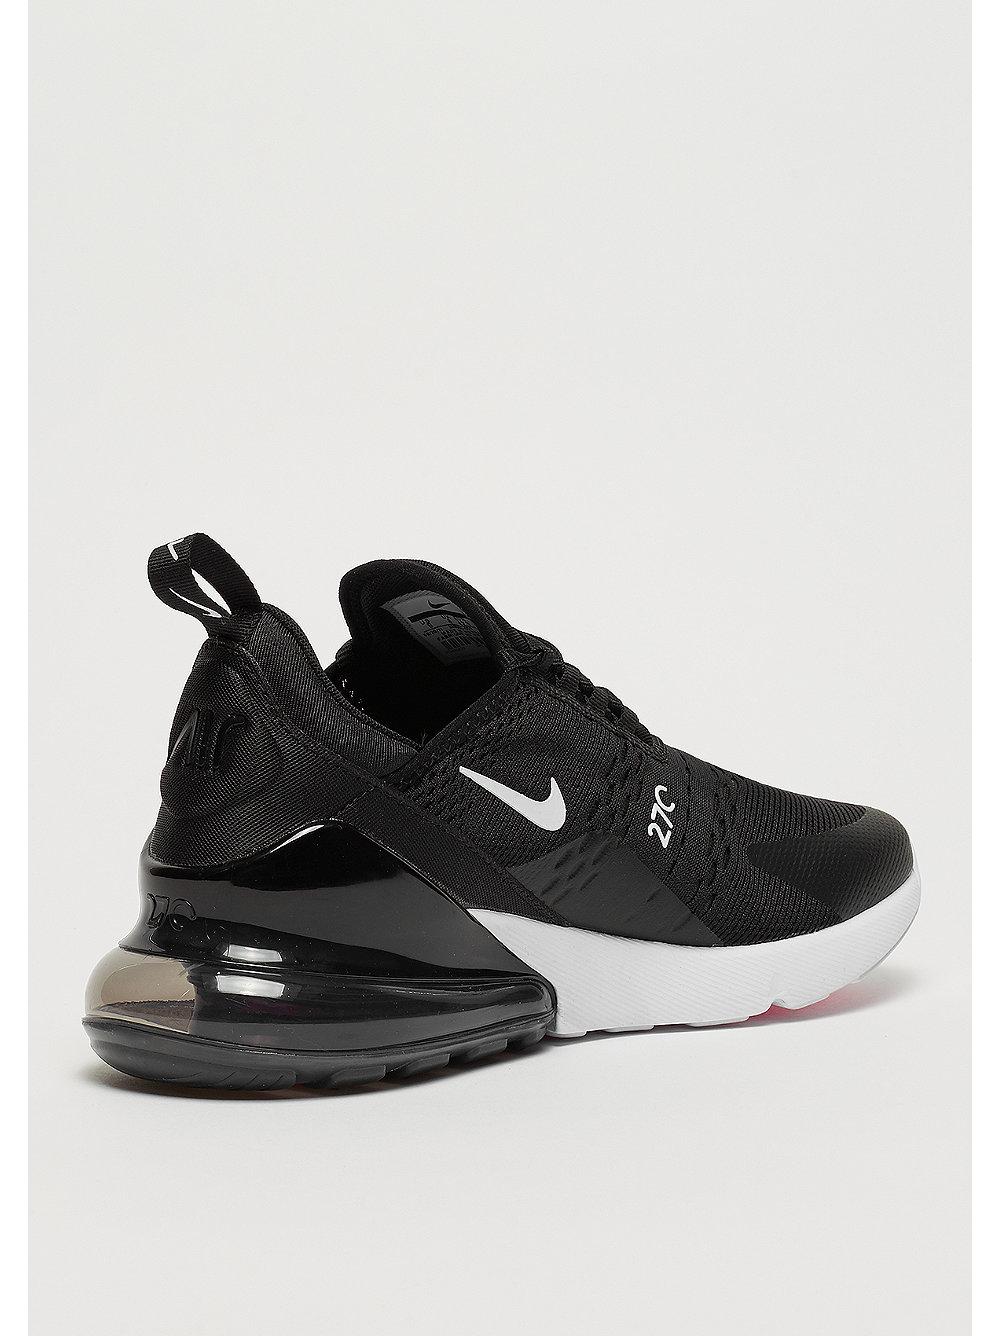 promo code 17cdf dbc6b Air Max 270 black Sneaker von NIKE bei SNIPES!